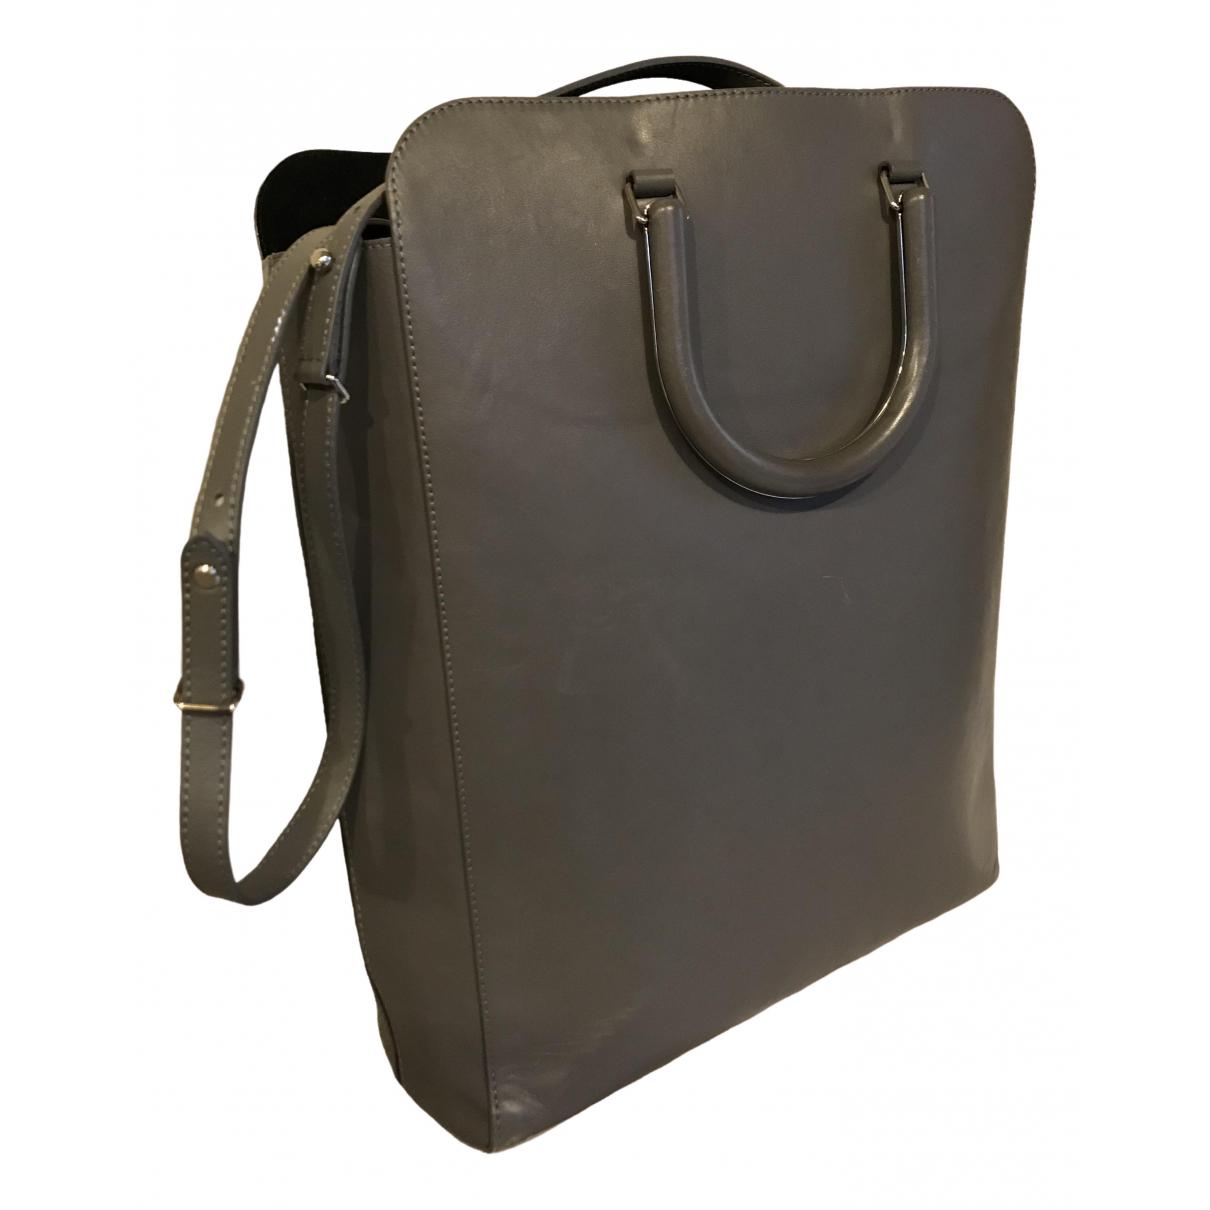 Maison Martin Margiela \N Grey Leather handbag for Women \N